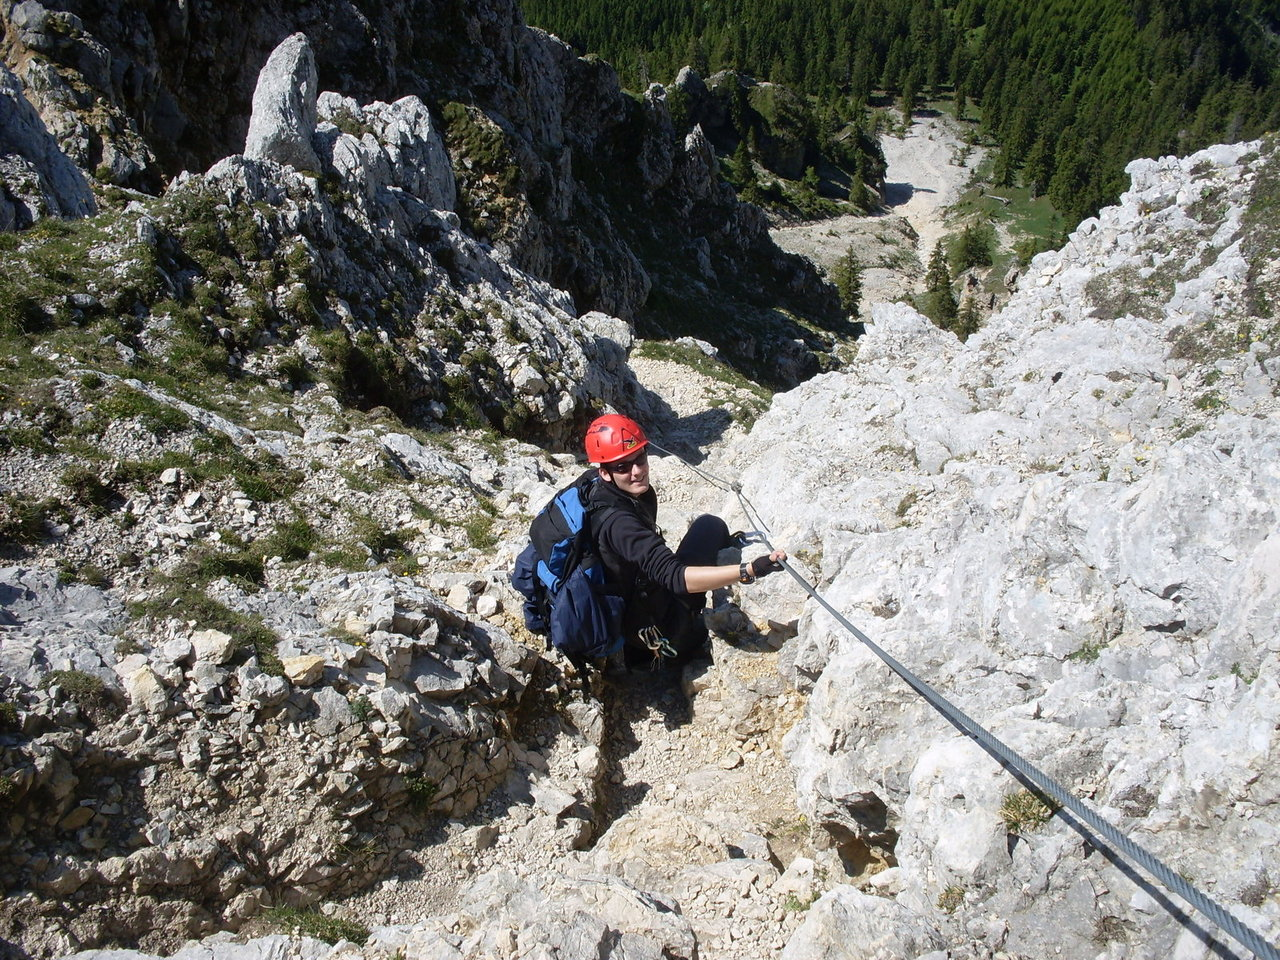 Klettersteig Tannheimer Tal : Tannheimer tal friedberger klettersteig and rote flueh in nature